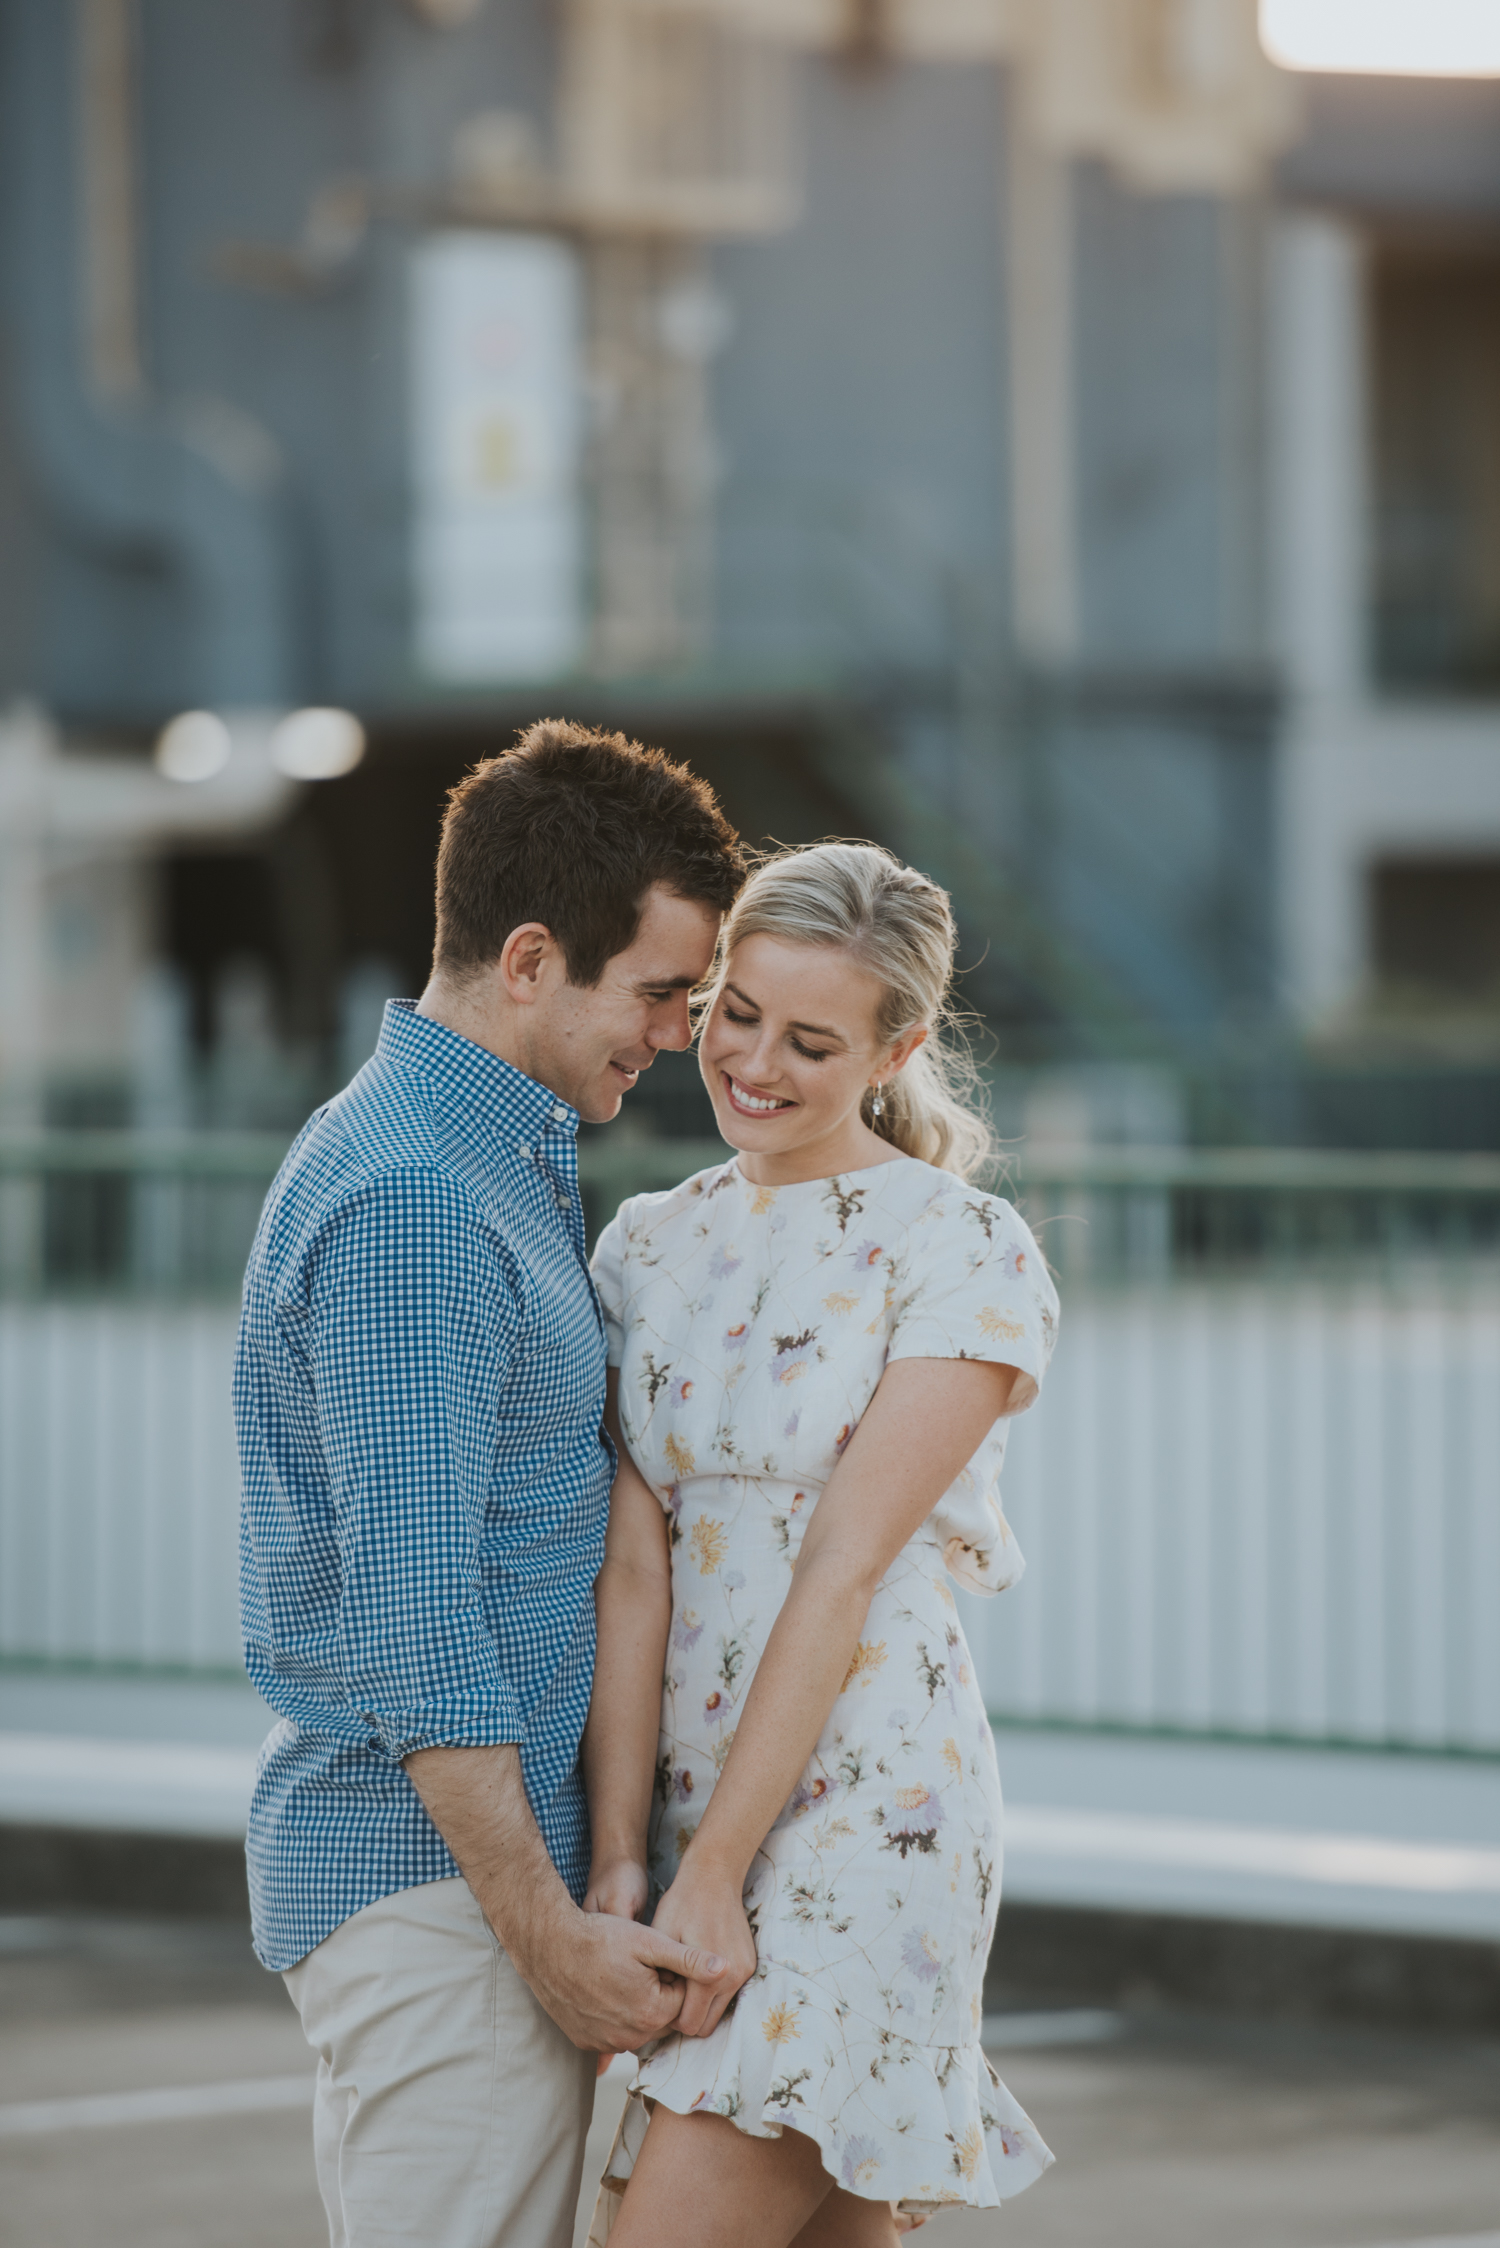 Brisbane Engagement | Wedding Photography-17.jpg